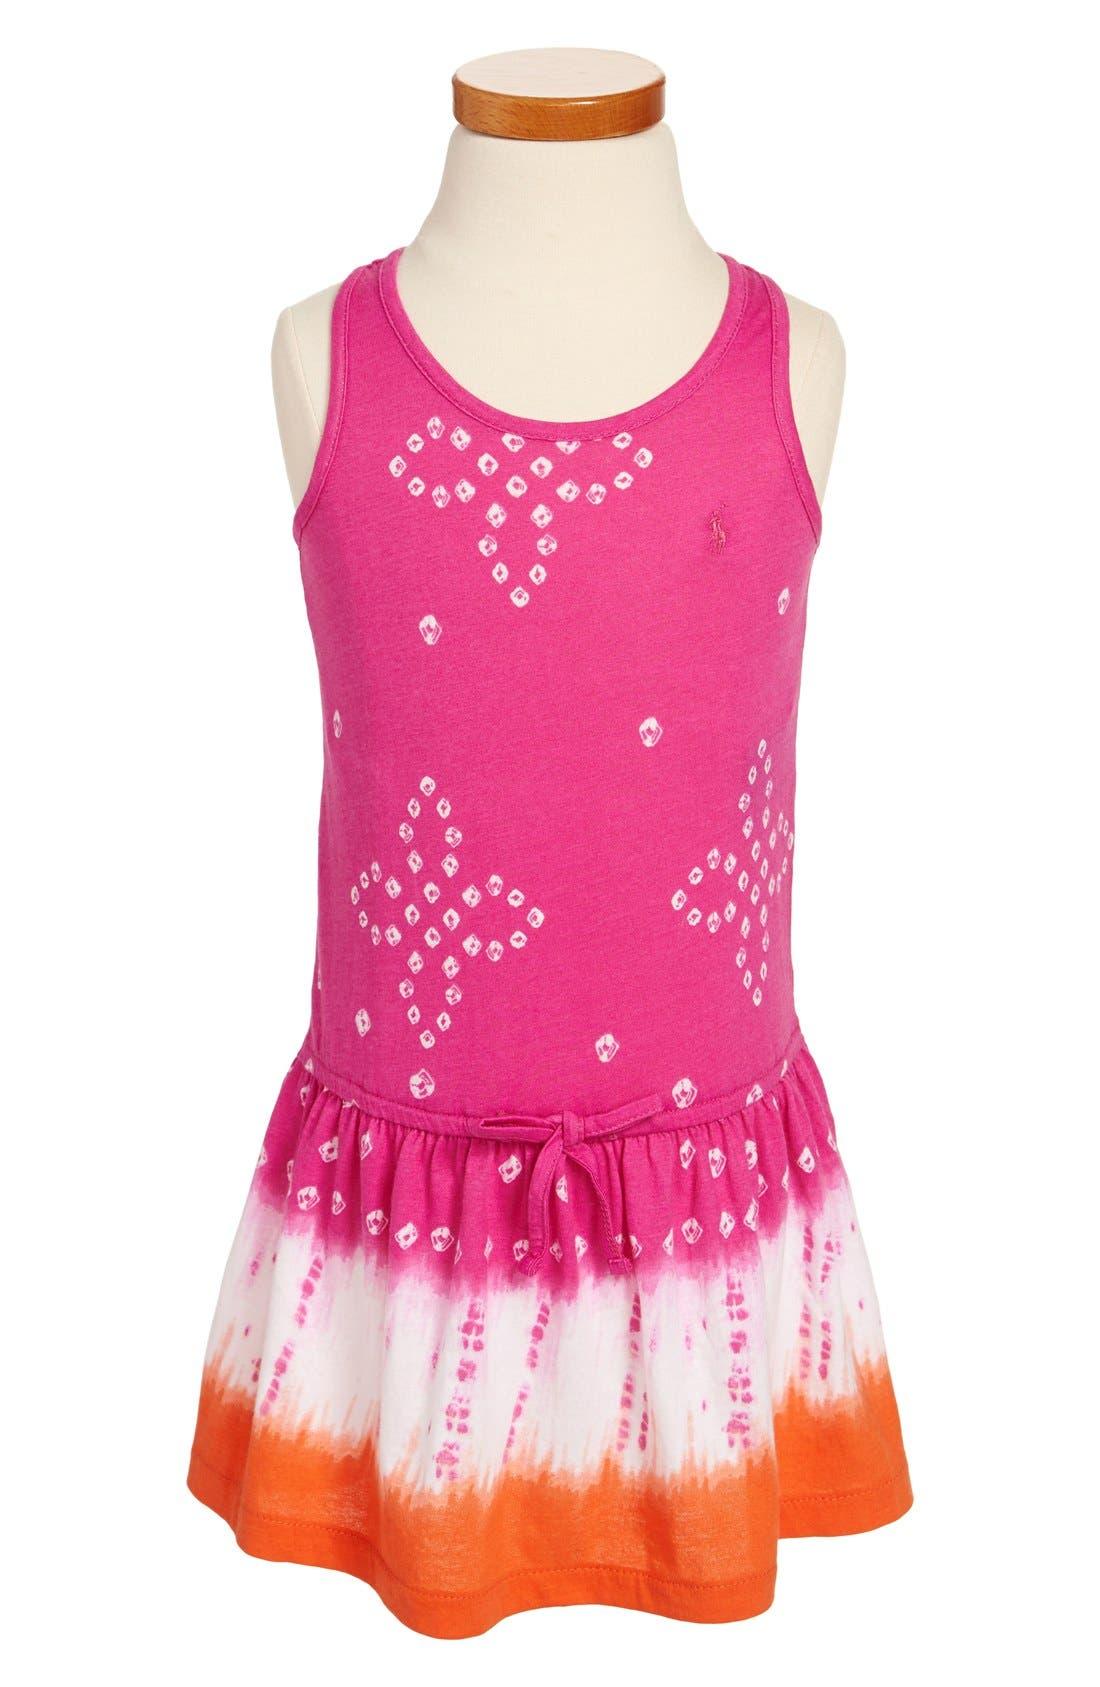 Alternate Image 1 Selected - Ralph Lauren Tie Dye Racerback Drop Waist Cotton Jersey Dress (Toddler Girls)